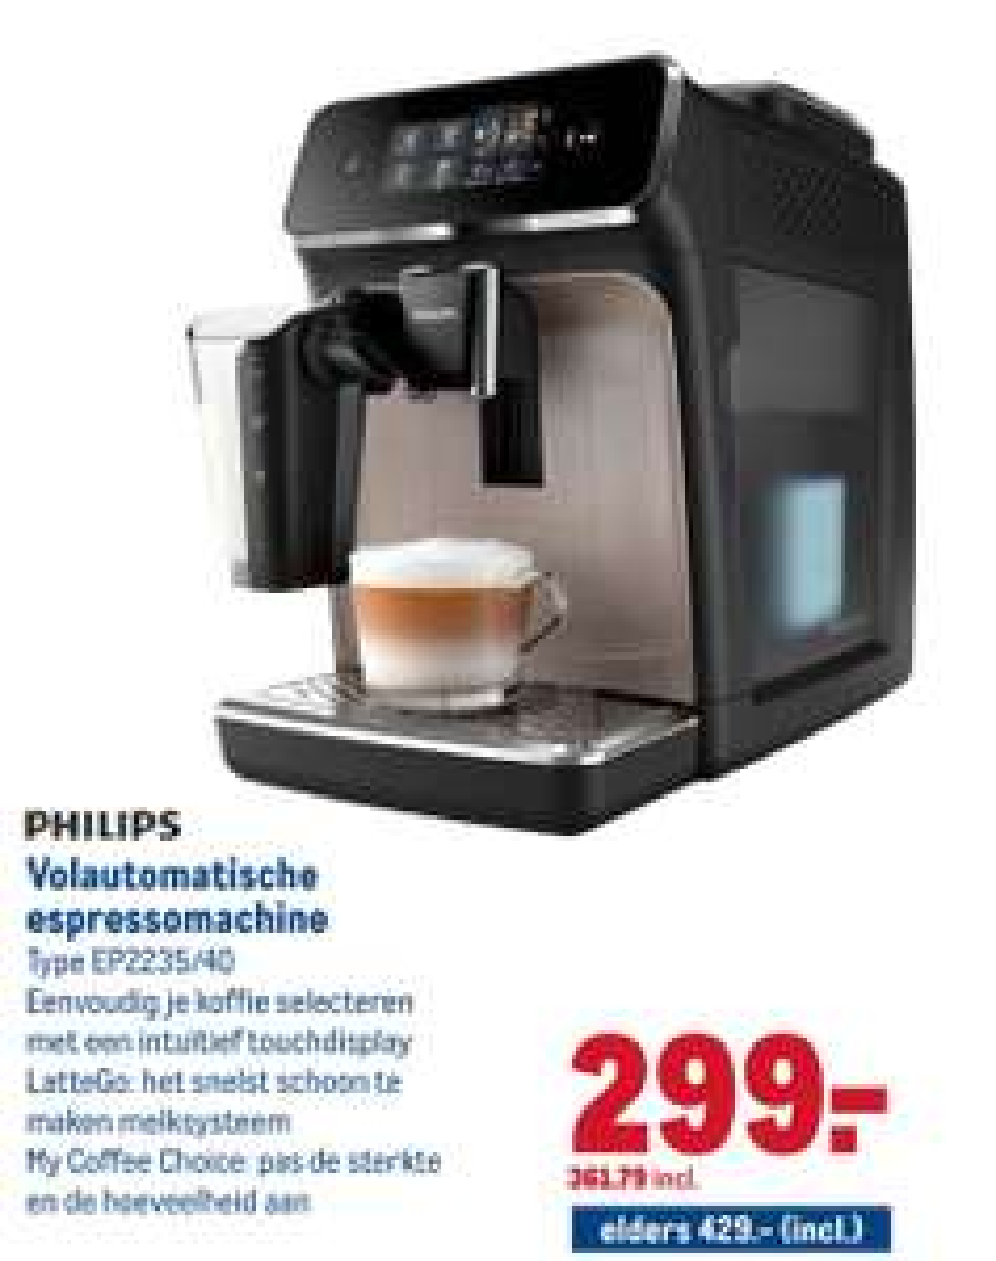 Philips EP2235/40 volautomatische espressomachines @Makro